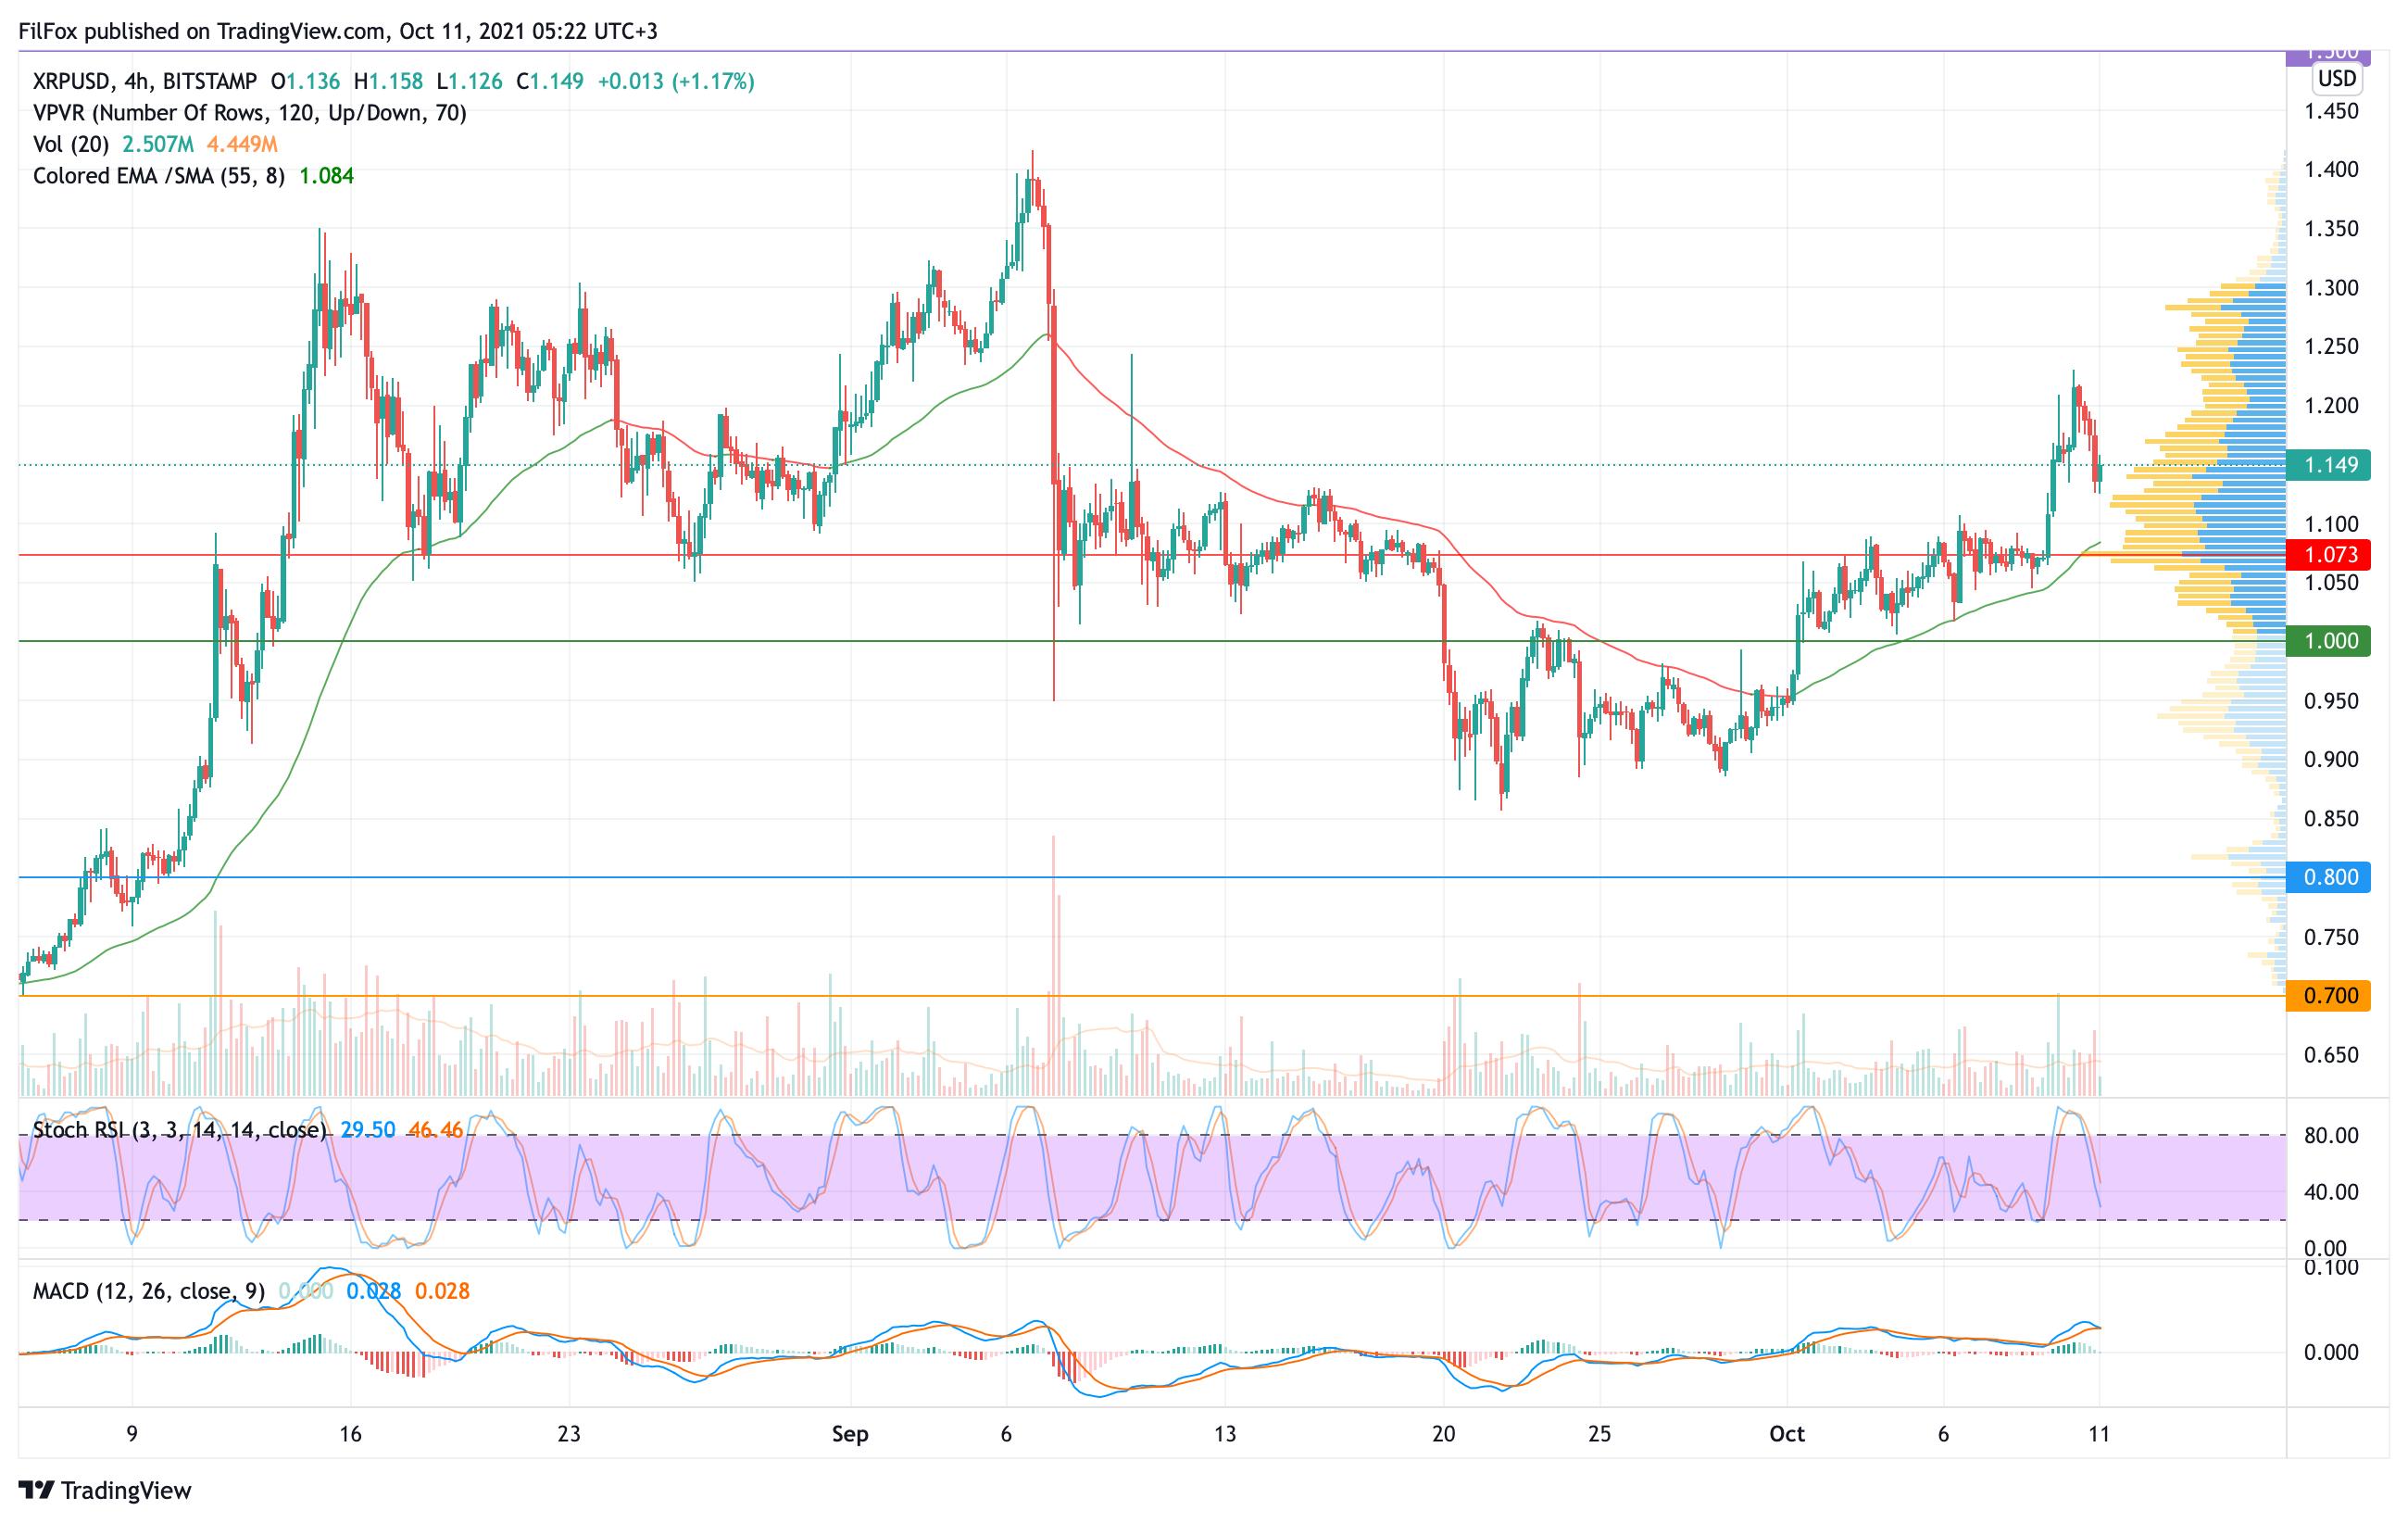 Анализ цен Bitcoin, Ethereum, XRP на 11.10.2021